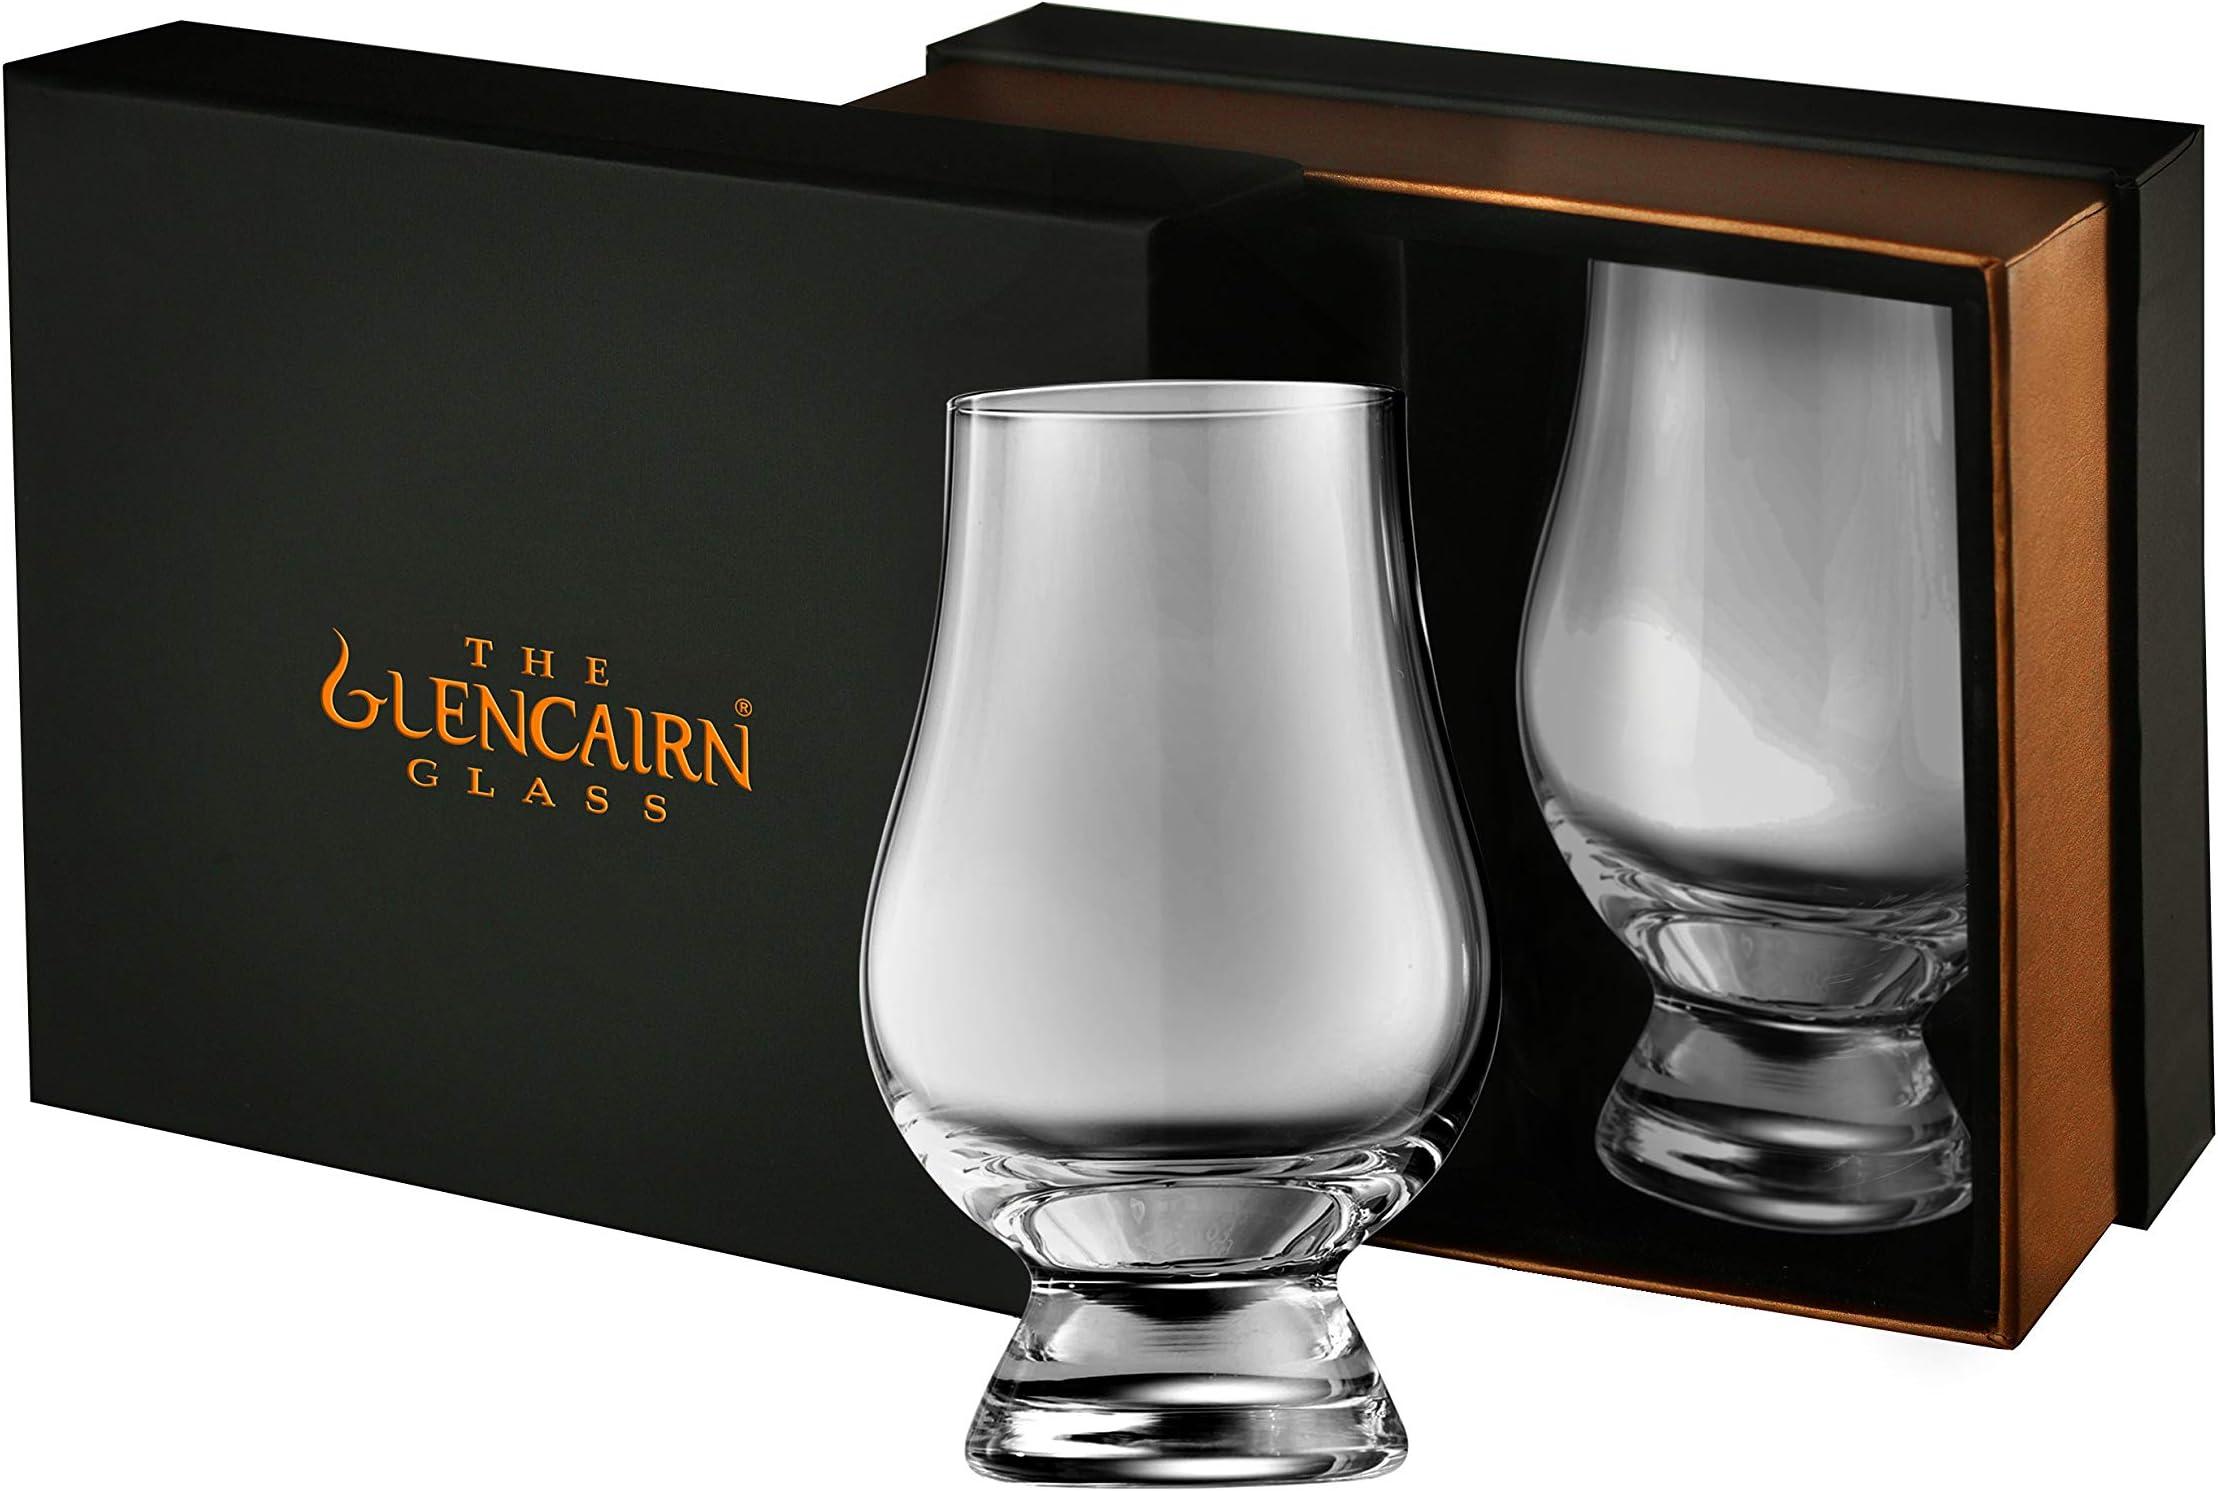 2 x Glencairn Whisky Glass in Presentation Box